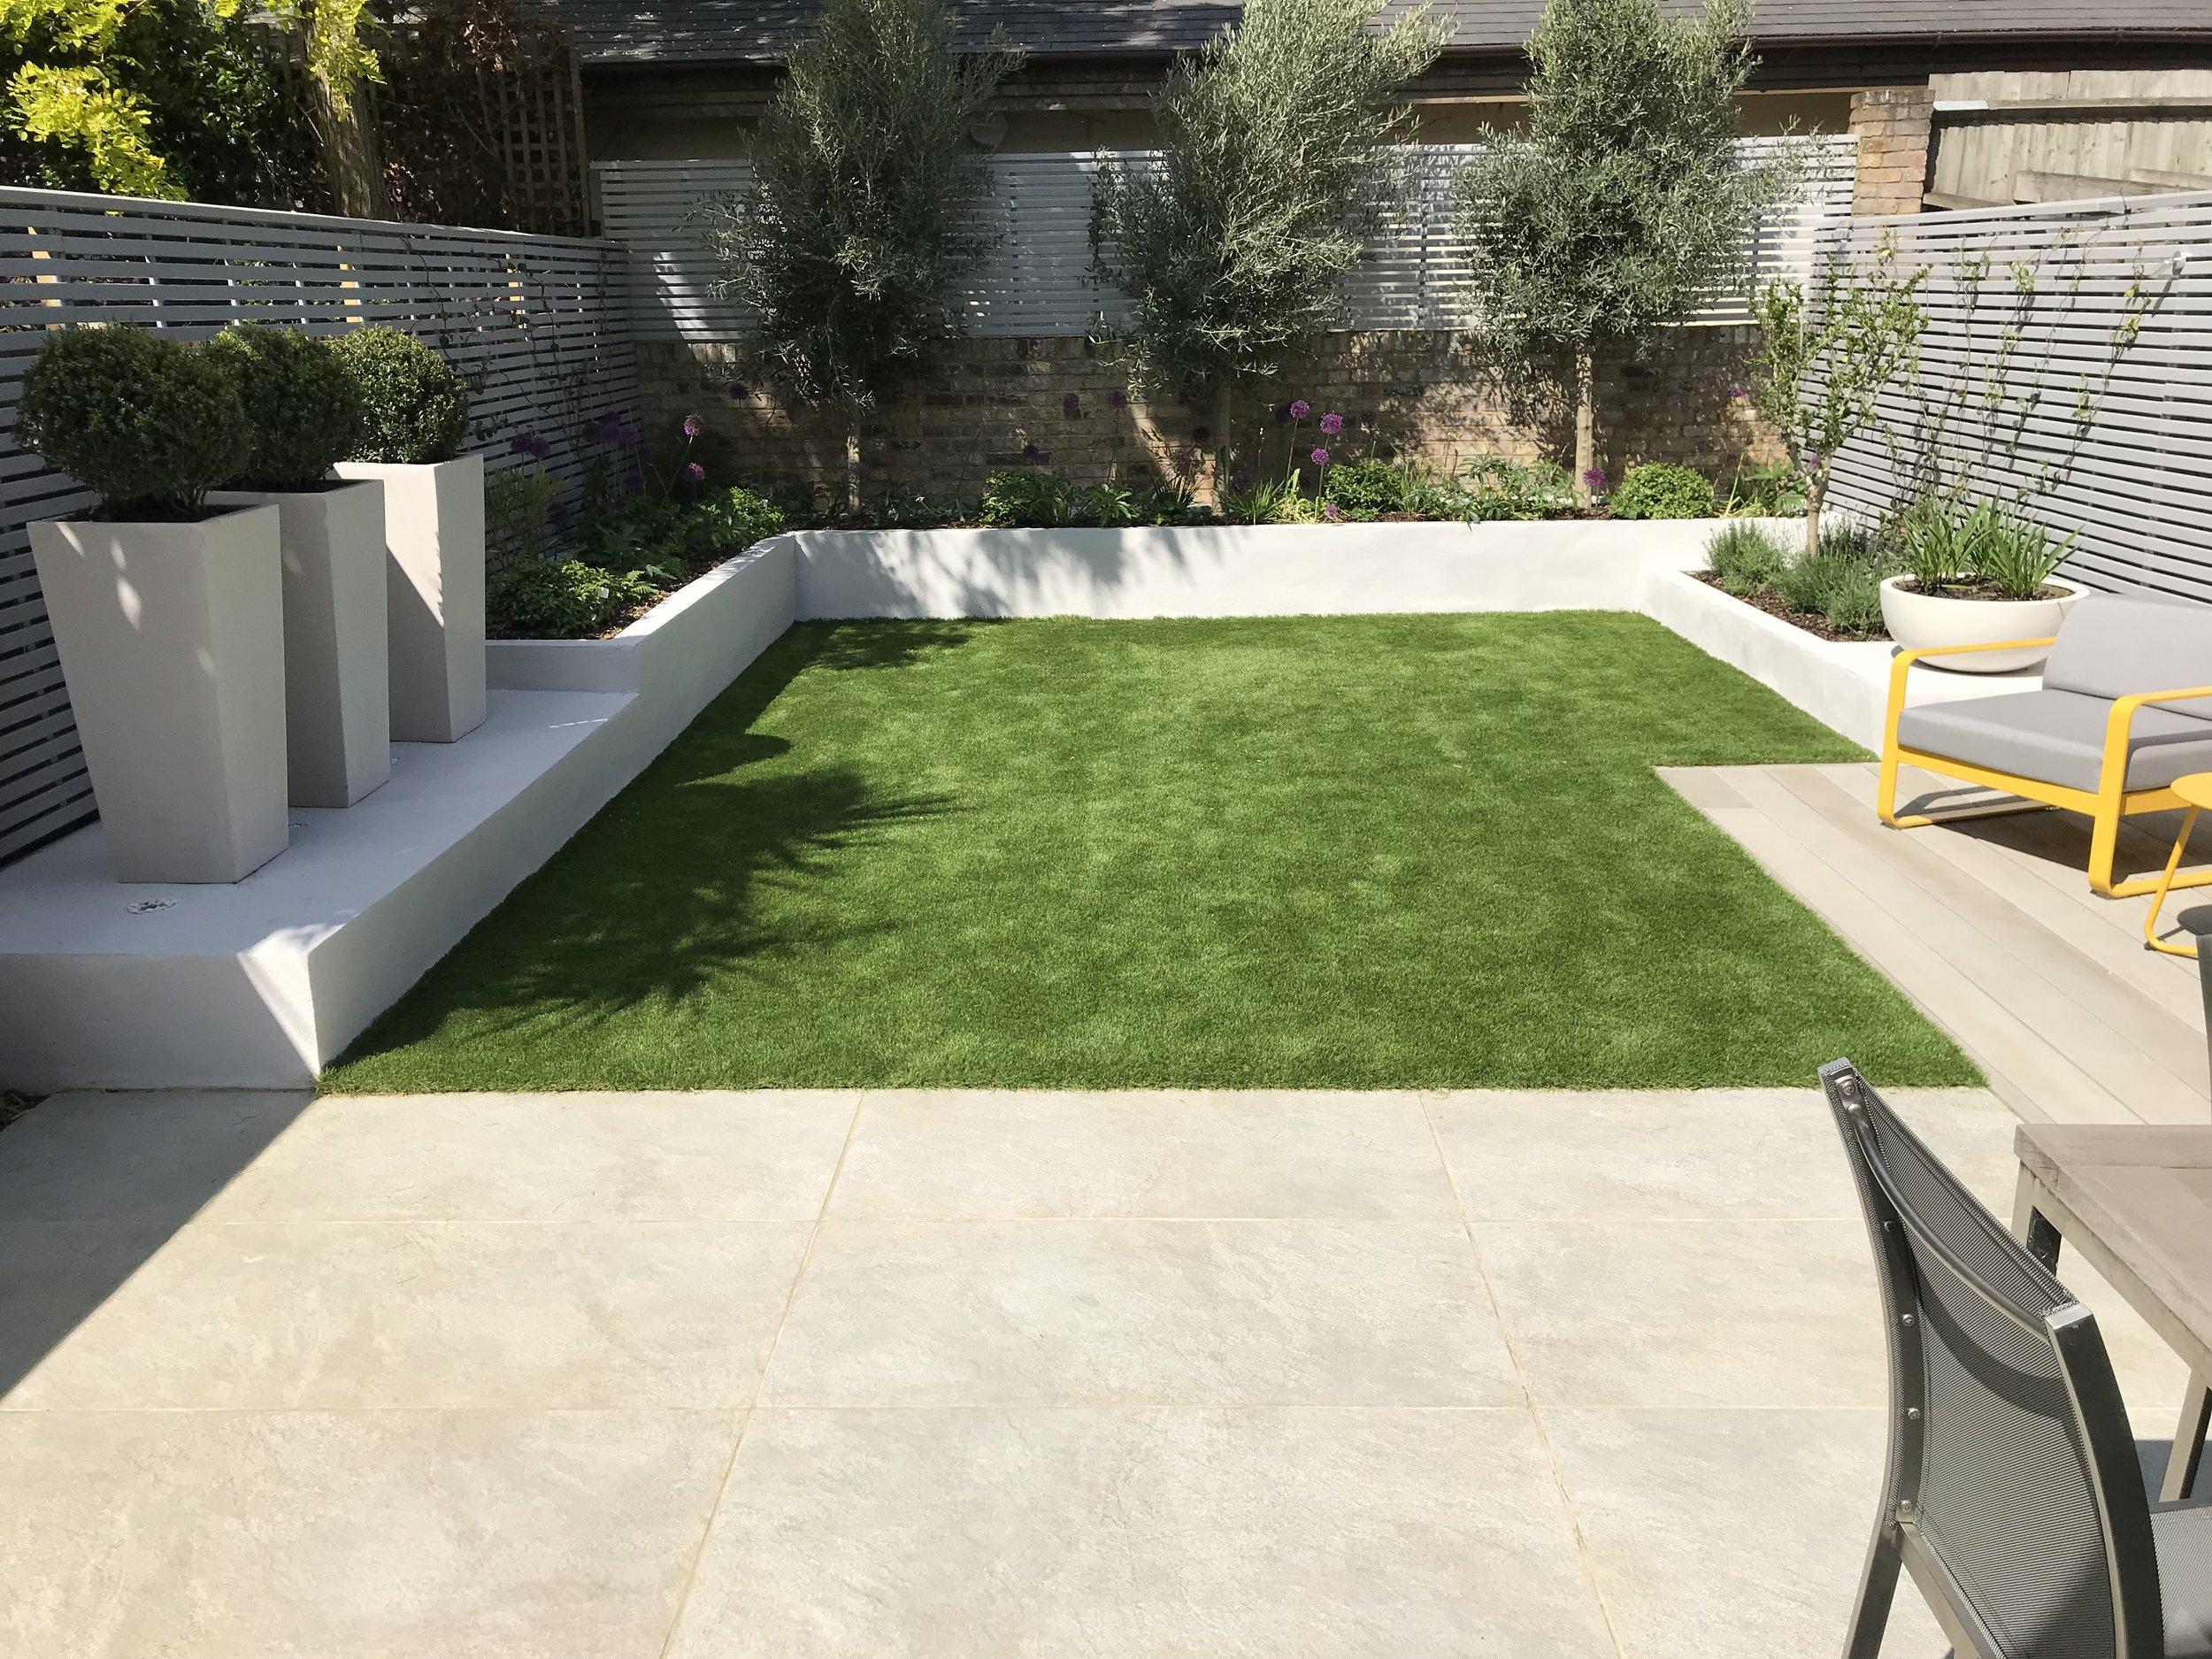 joanna_archer_garden_design_small_family_gardenW4_d.jpg